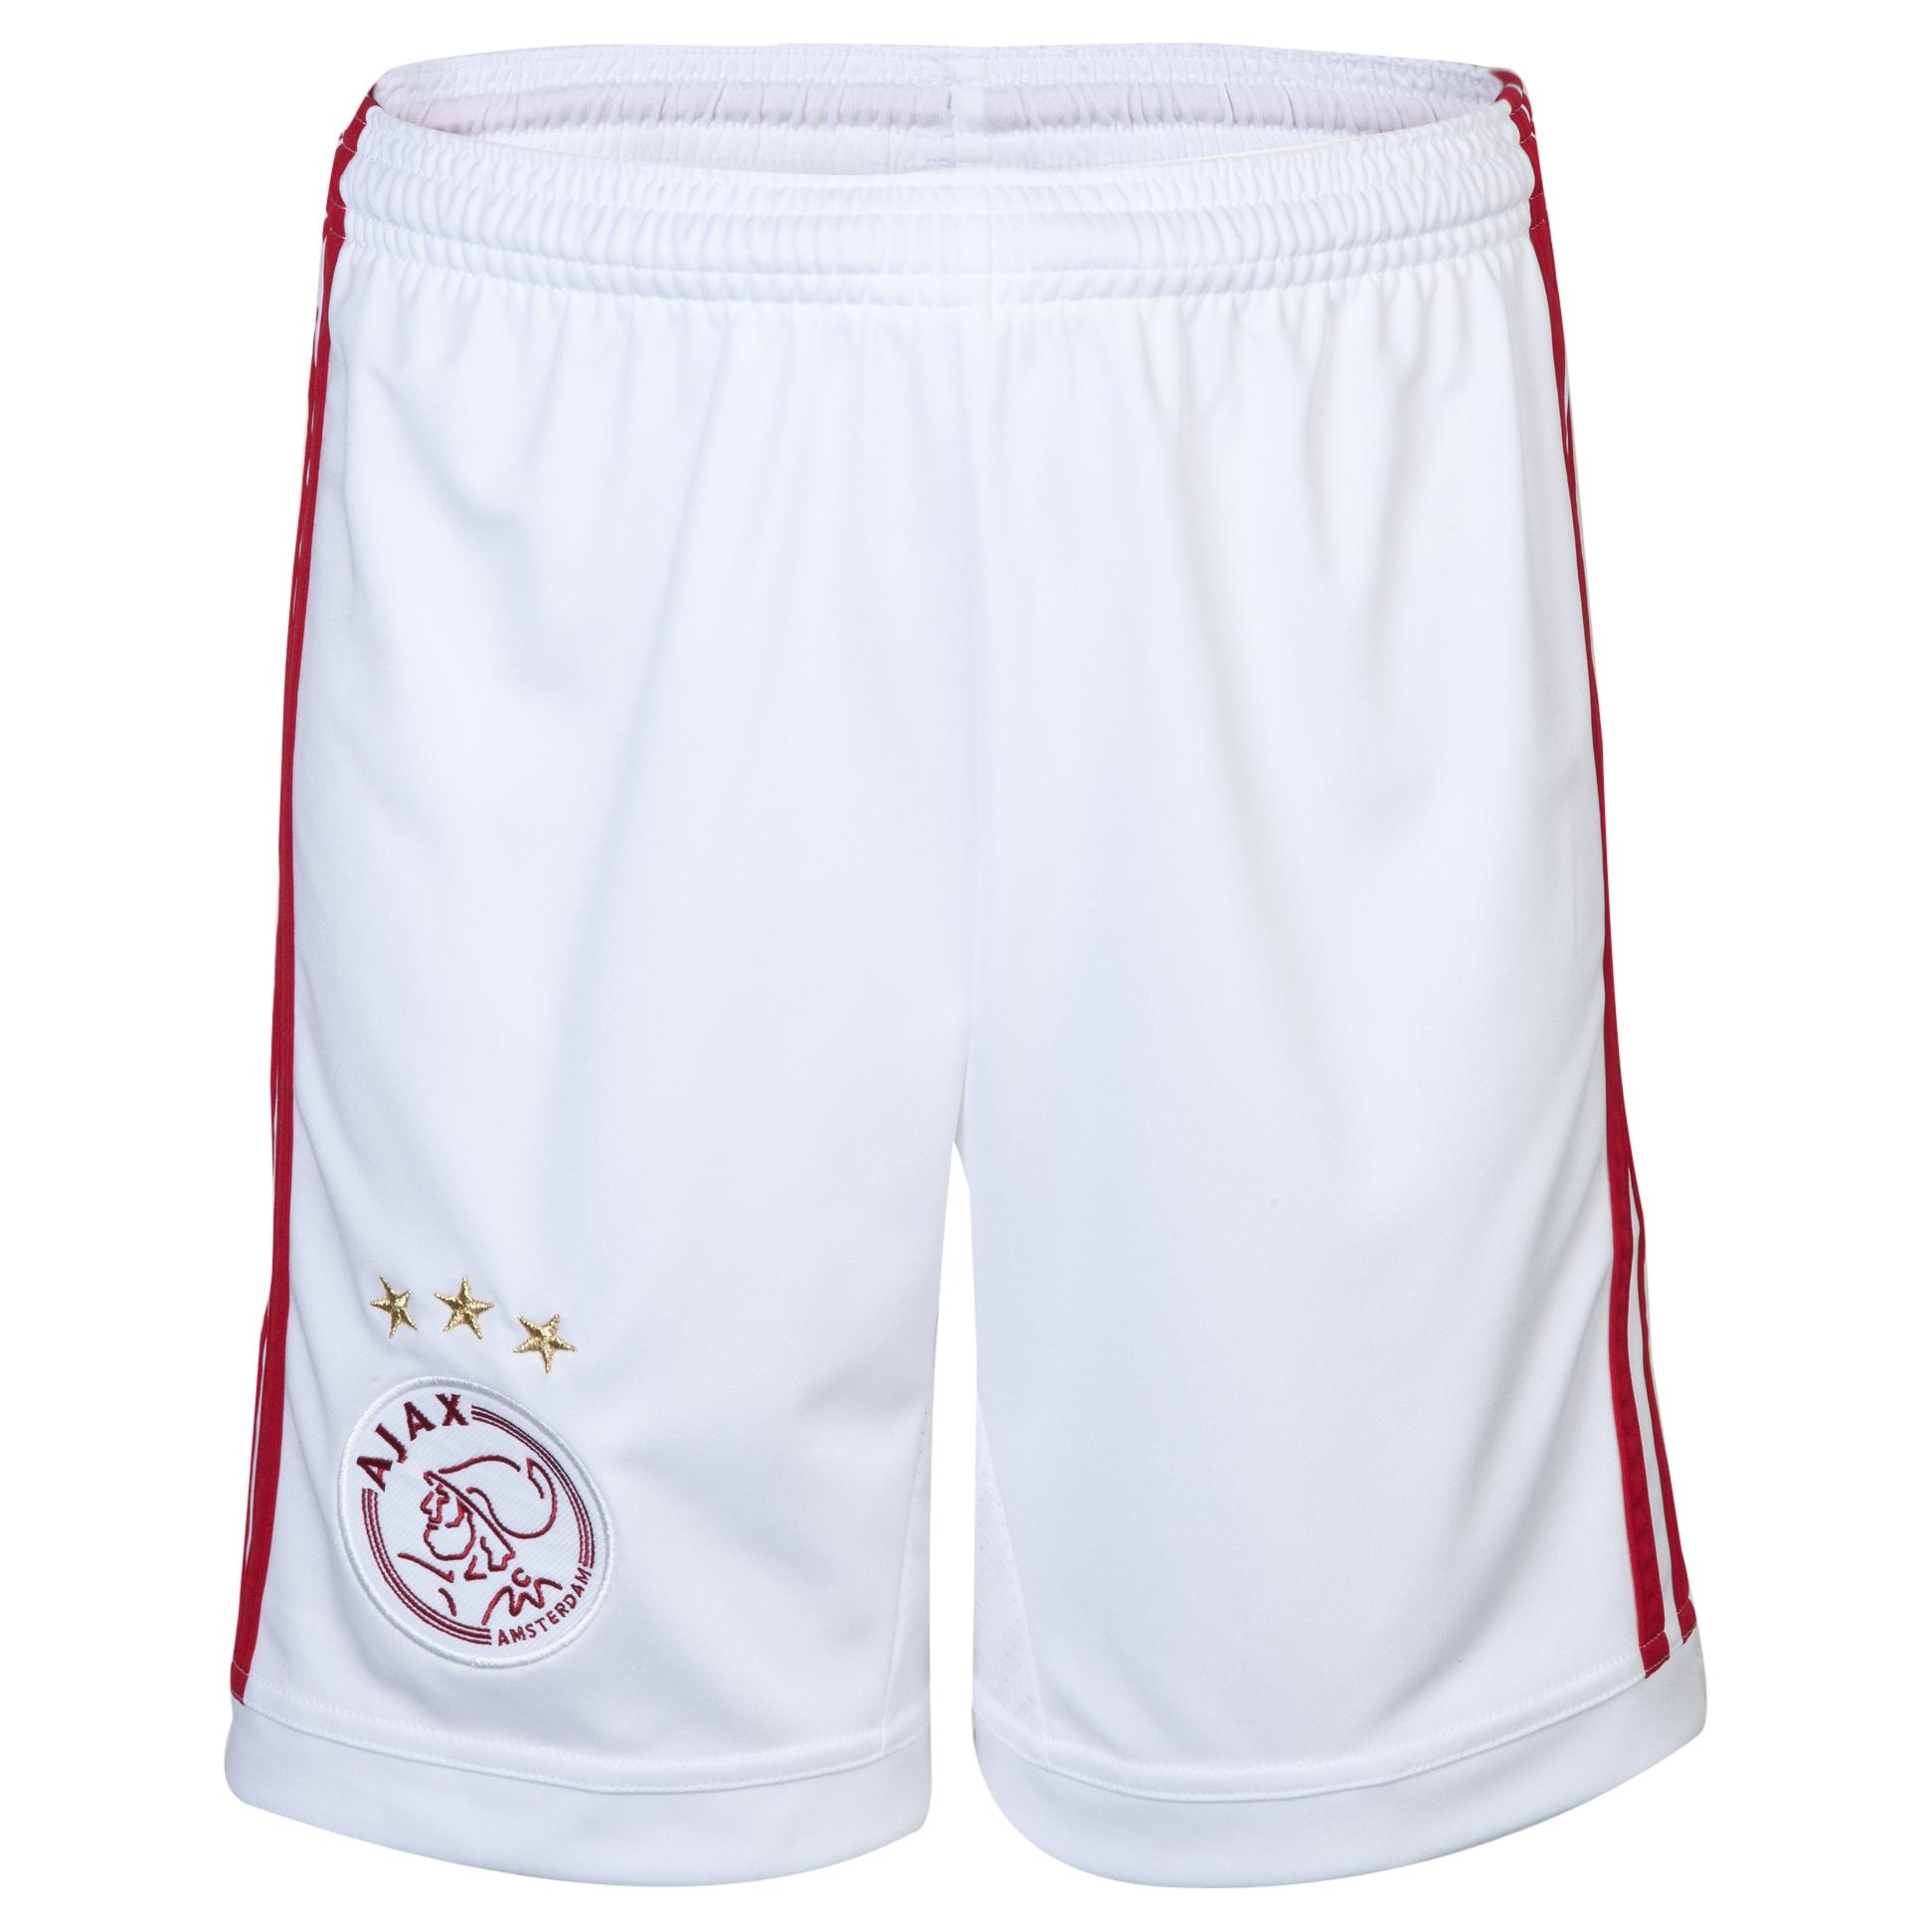 Ajax Home Shorts 2013/14